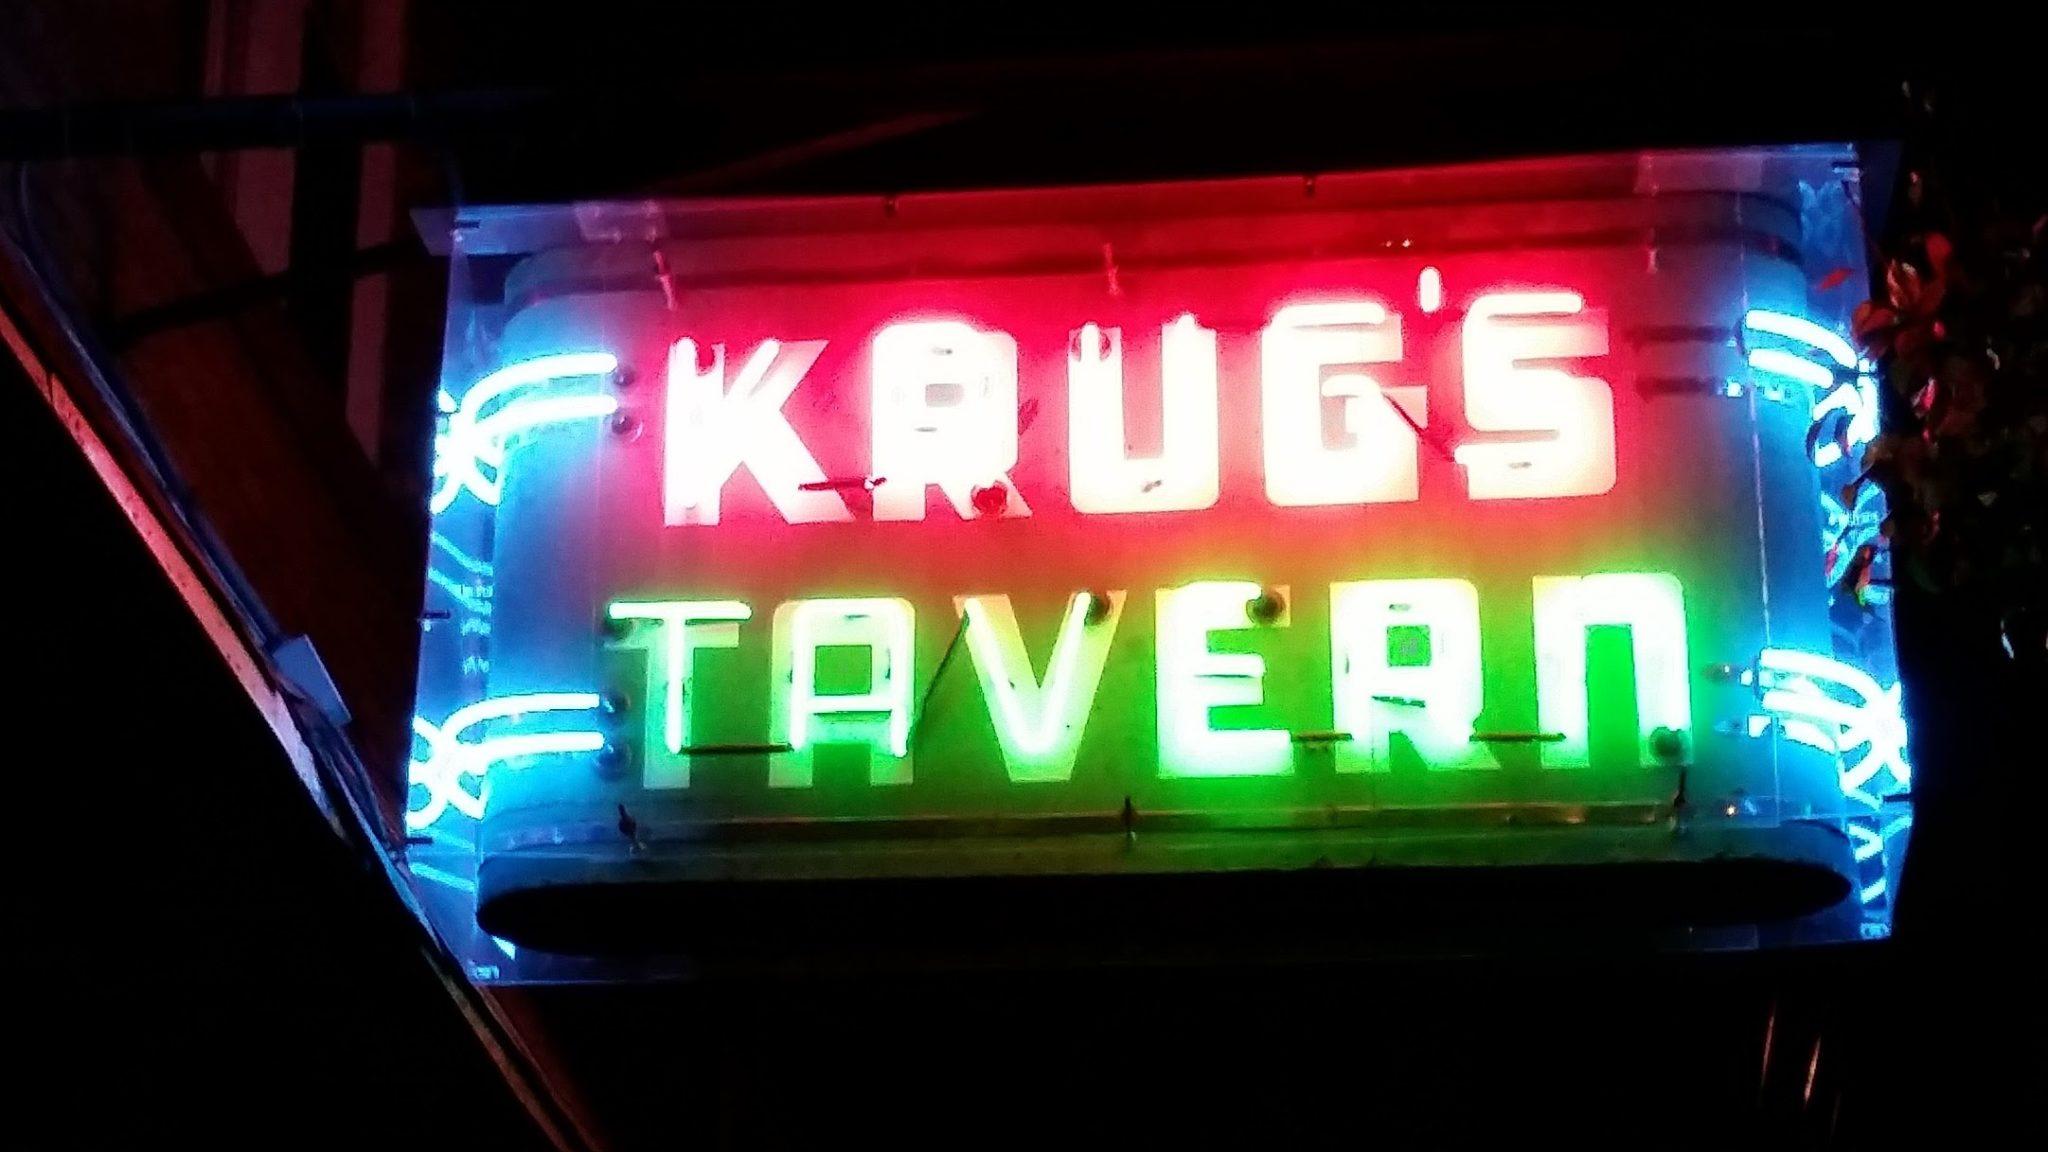 Krugs Tavern Newark - Mr Local History #1 pick